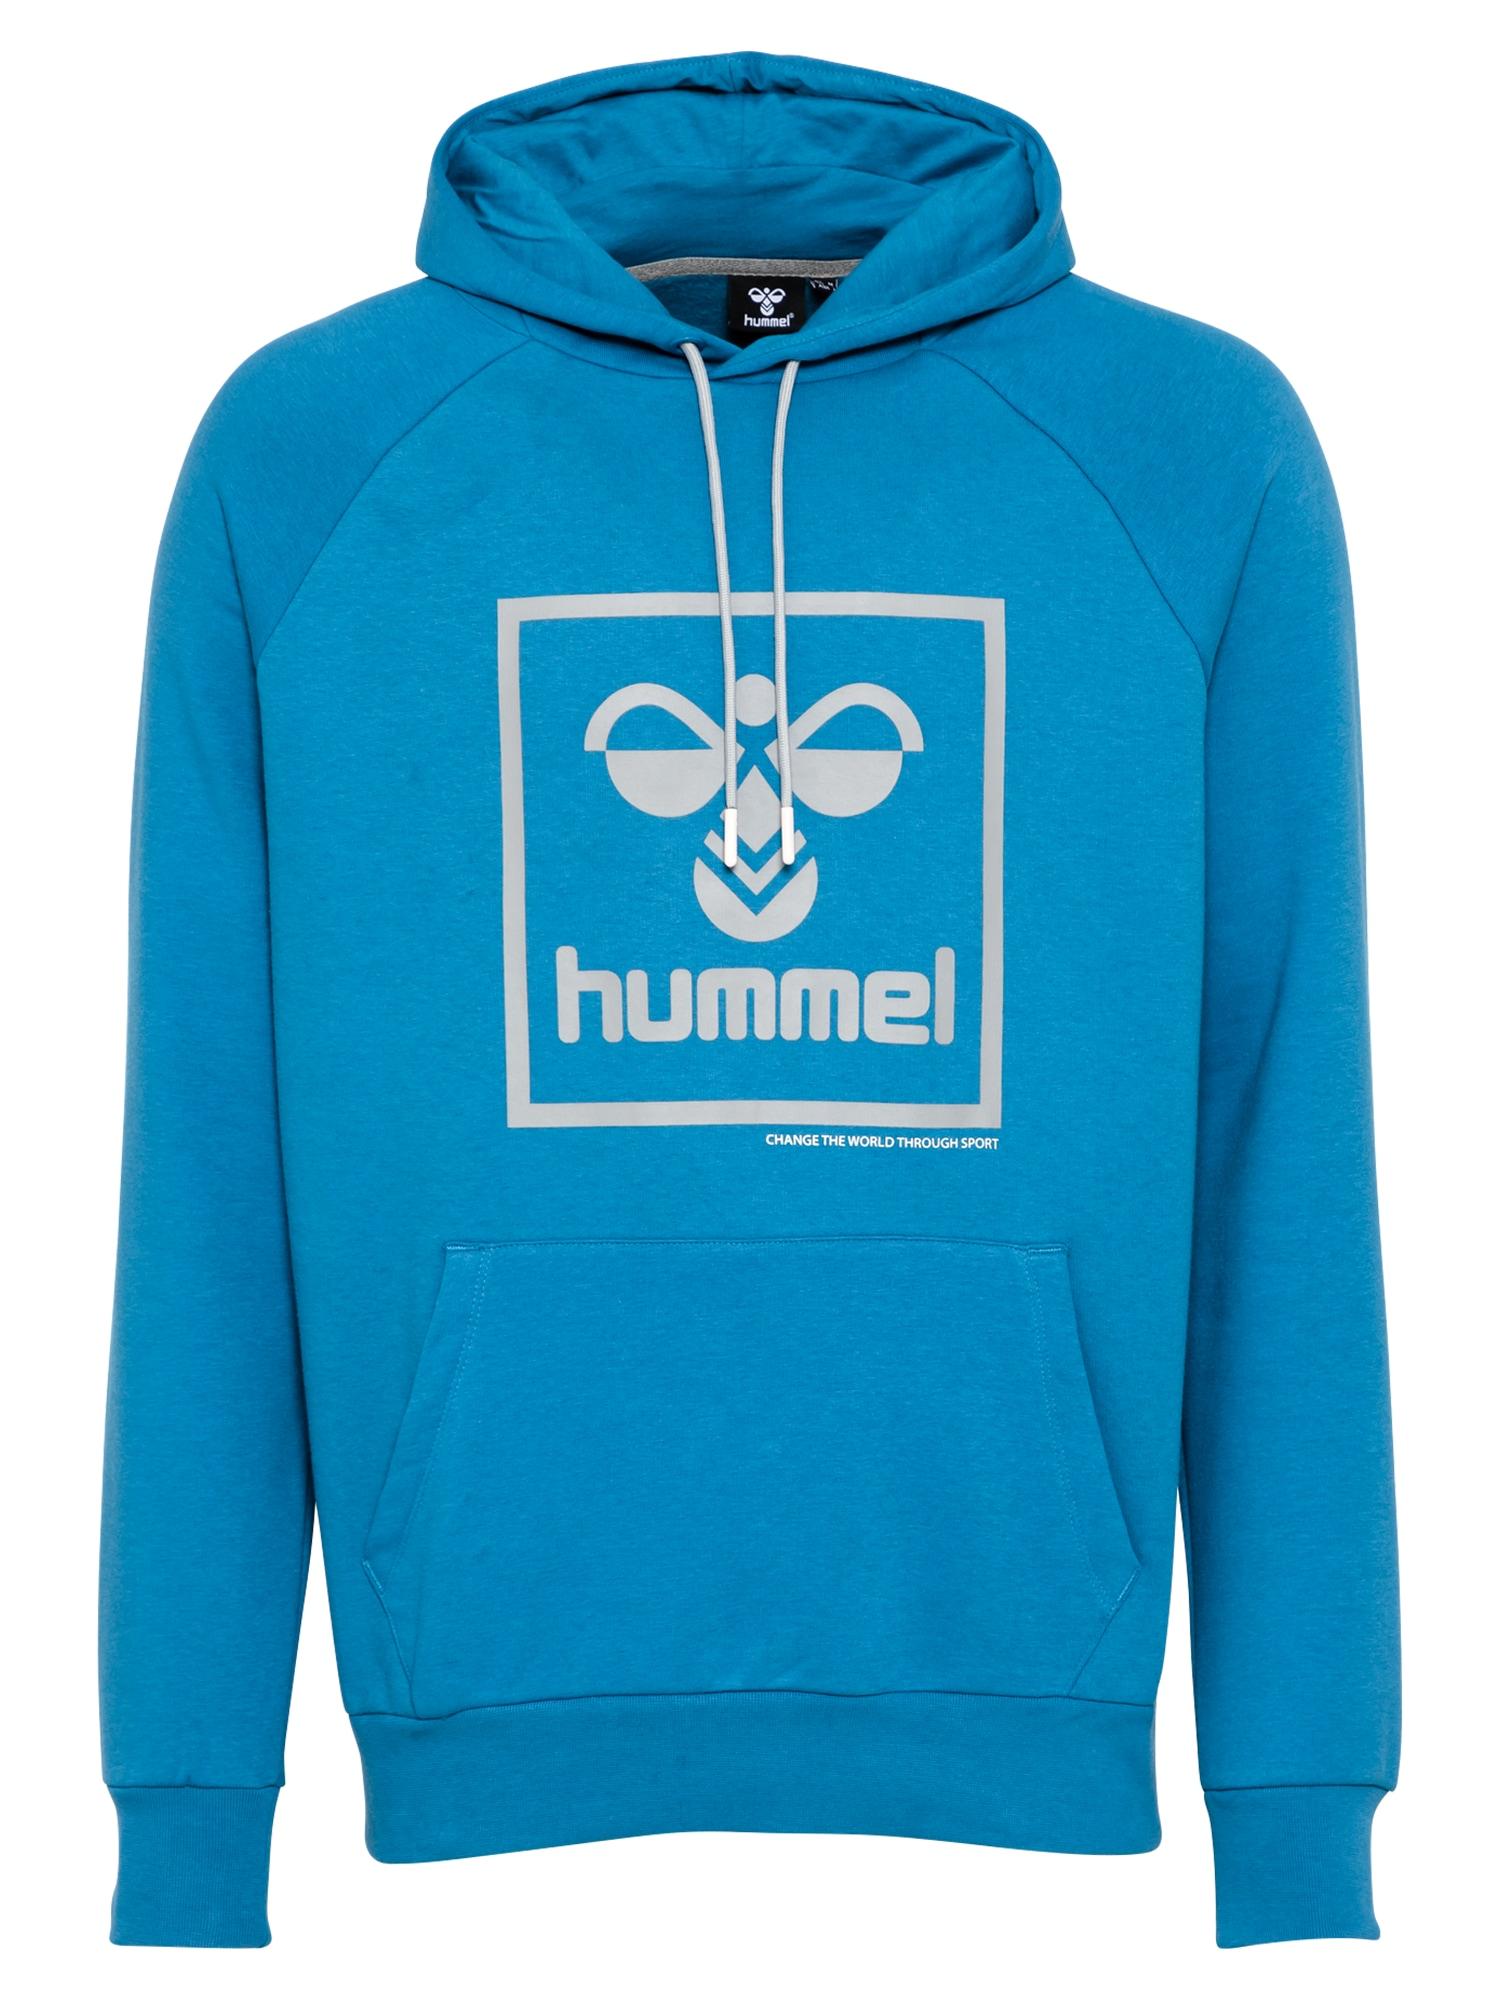 Hummel Sportinio tipo megztinis mėlyna / pilka